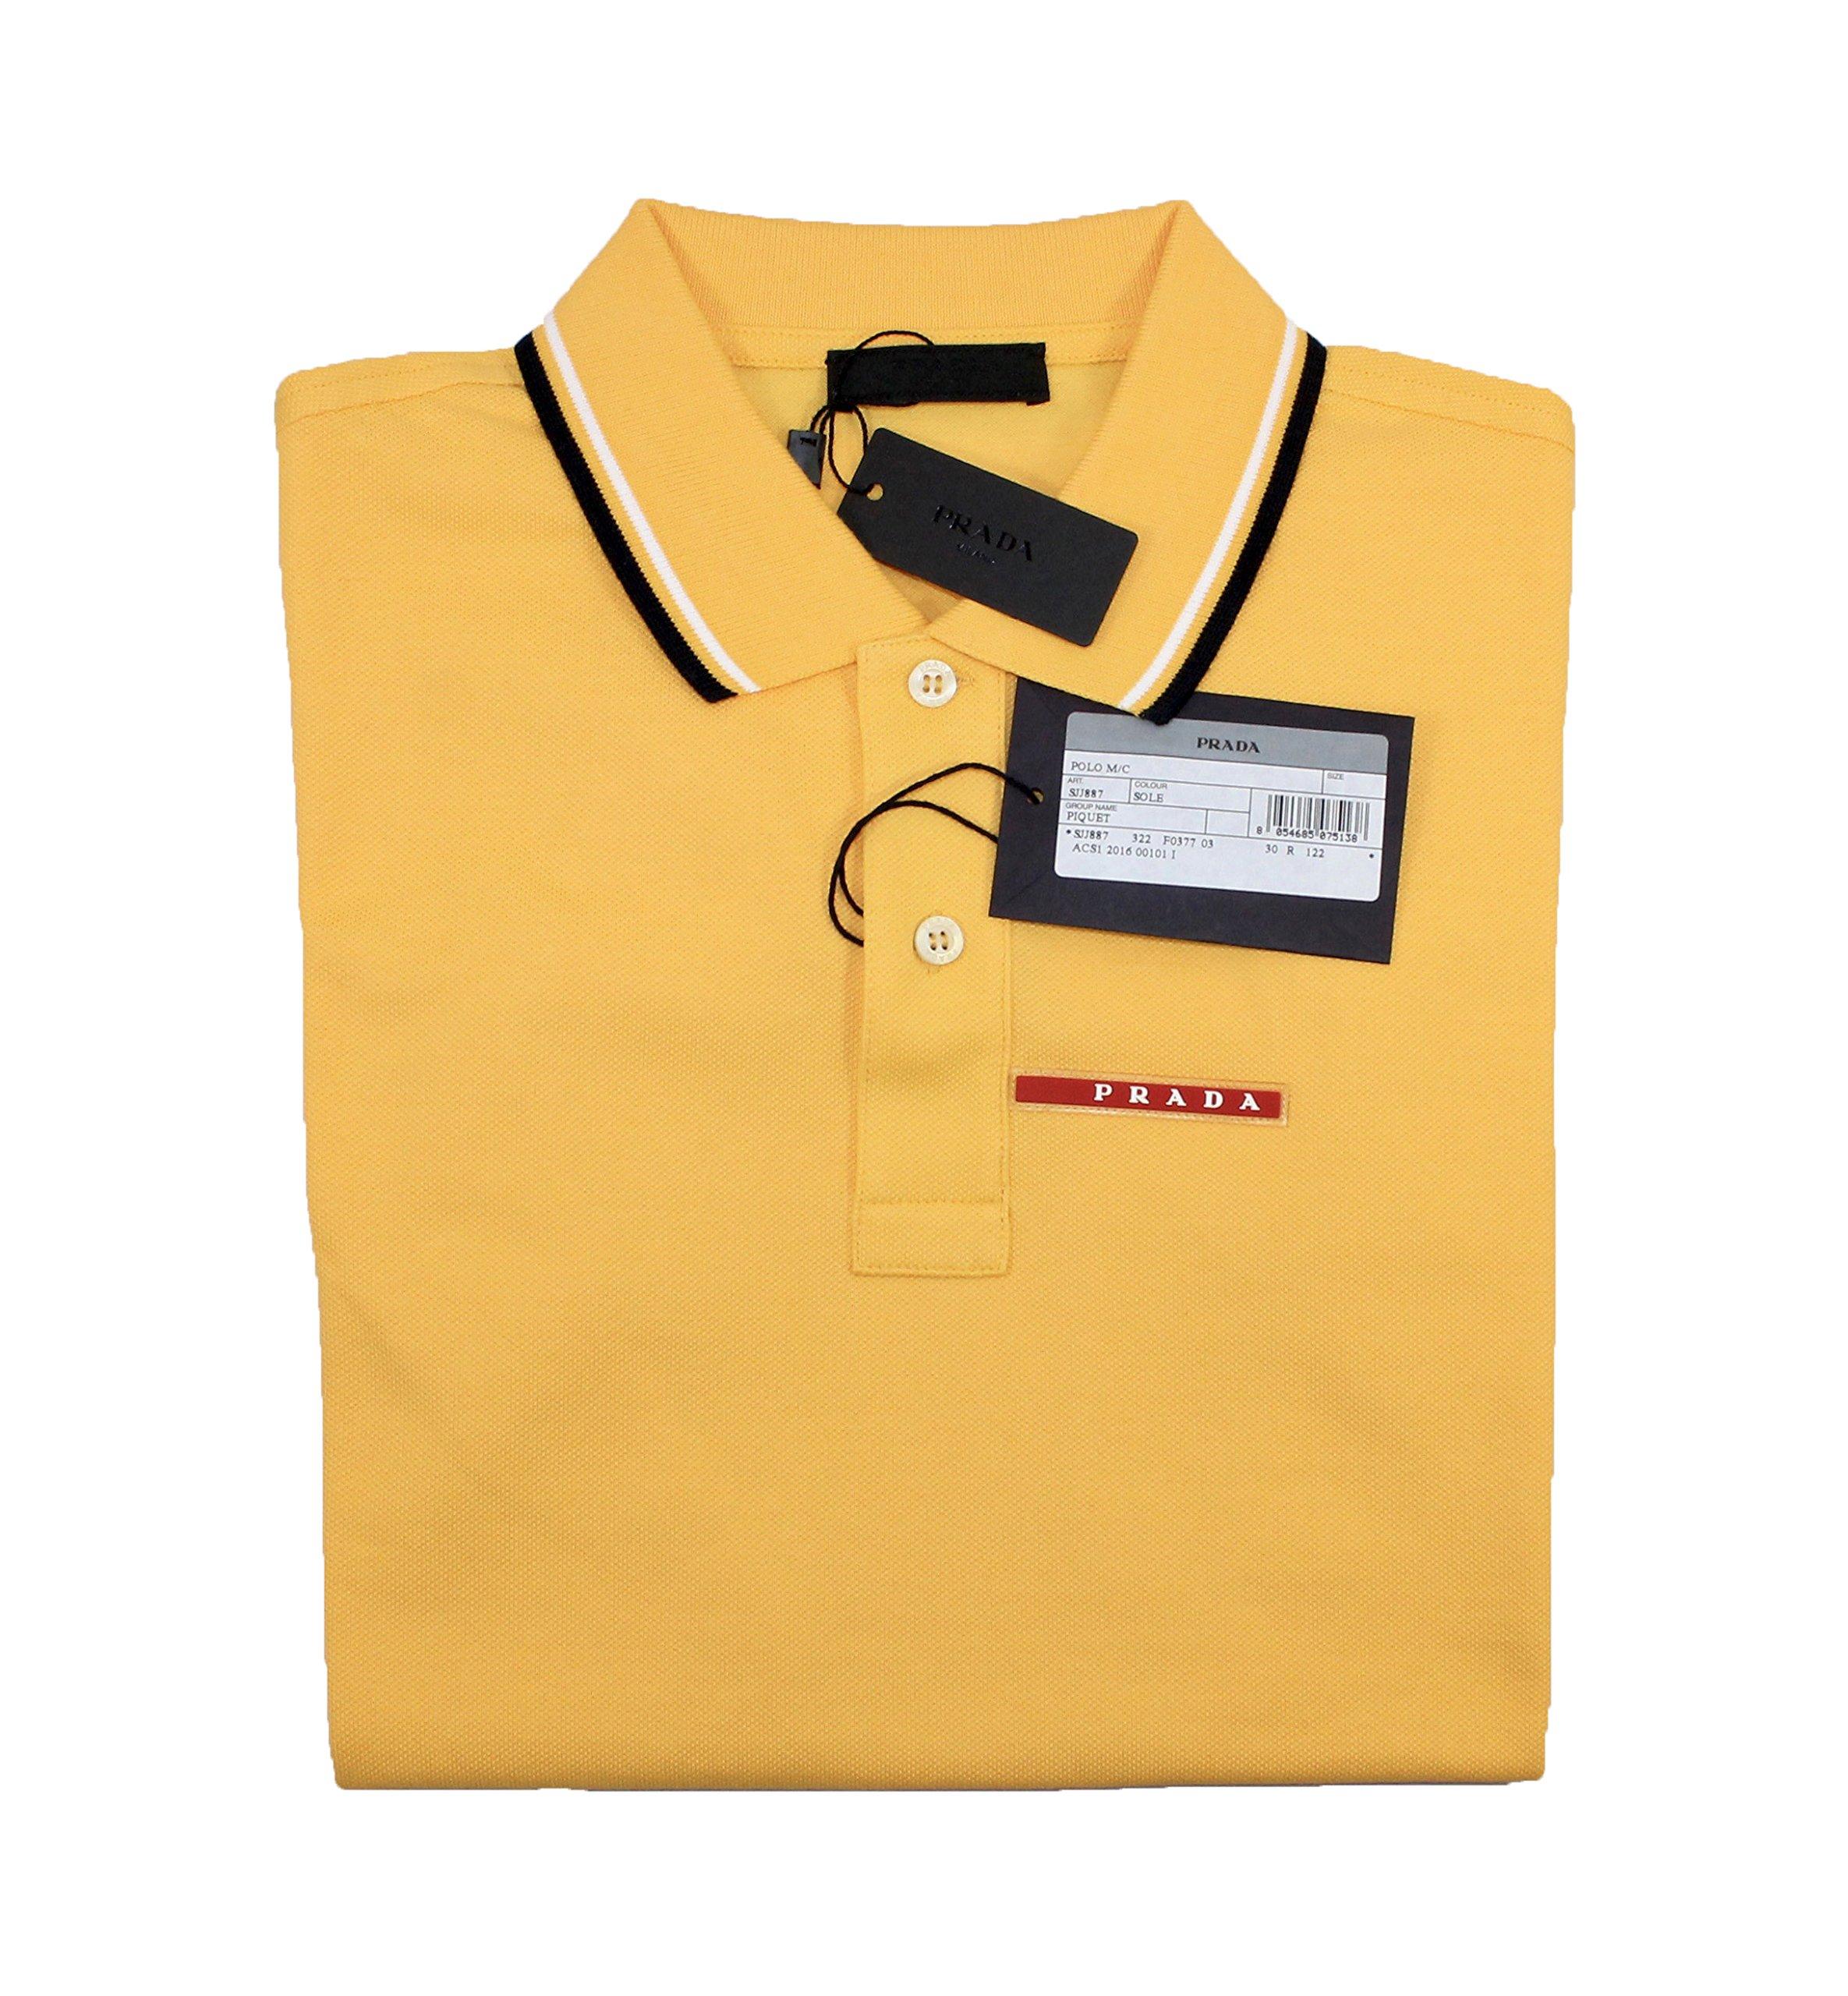 Prada Men's Cotton Piqué Short Sleeve Slim Fit Polo Shirt, Yellow (Sole) (Medium)